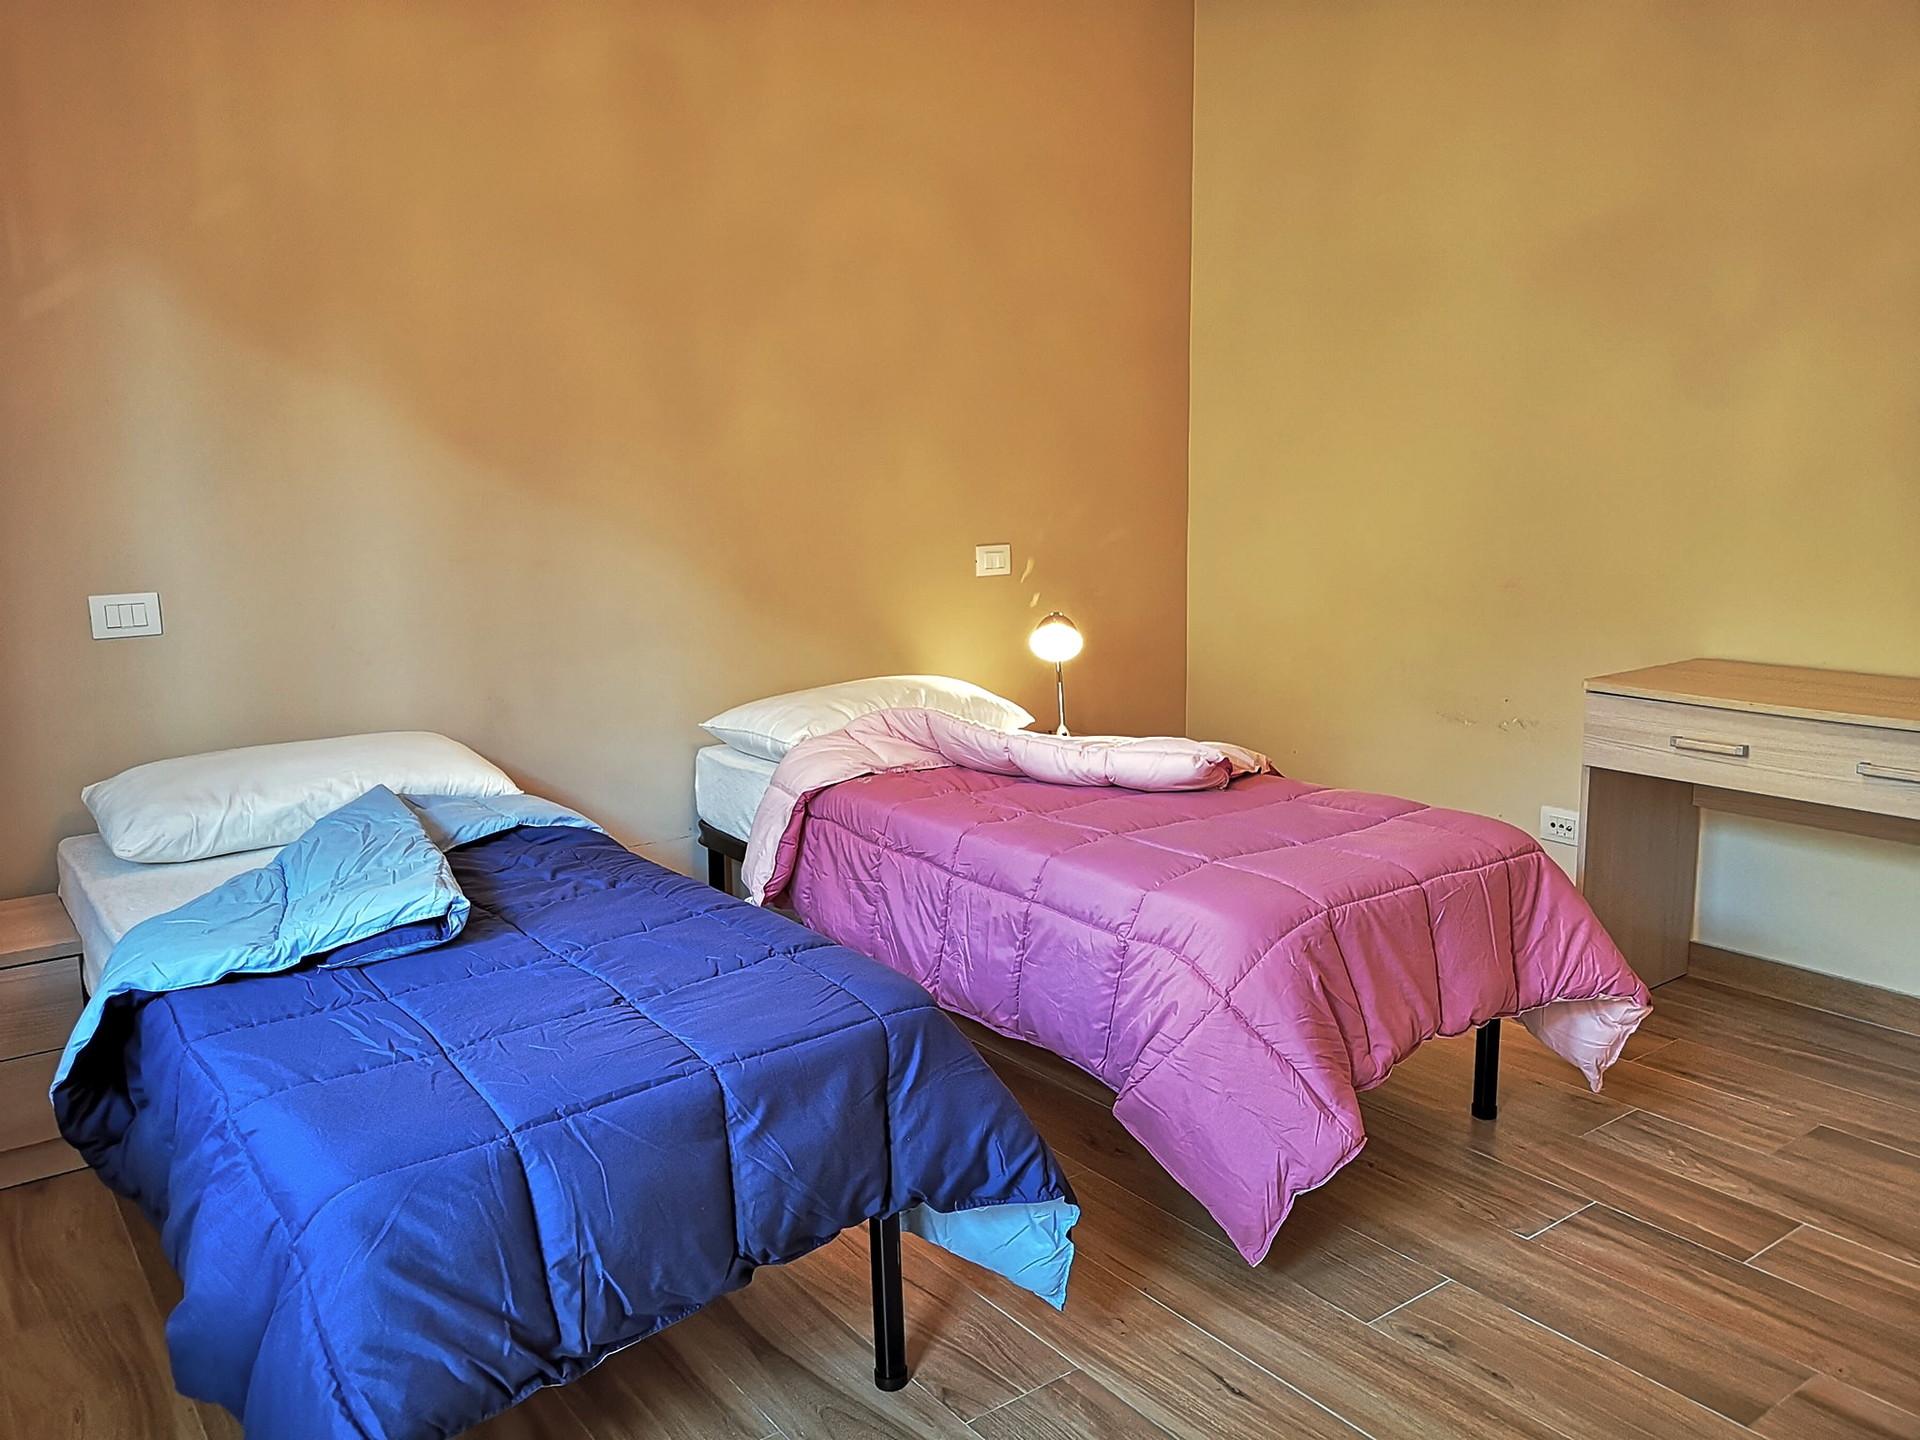 apartment-historical-city-reggio-calabria-d1484c16ad44a336b909a98be73512ca